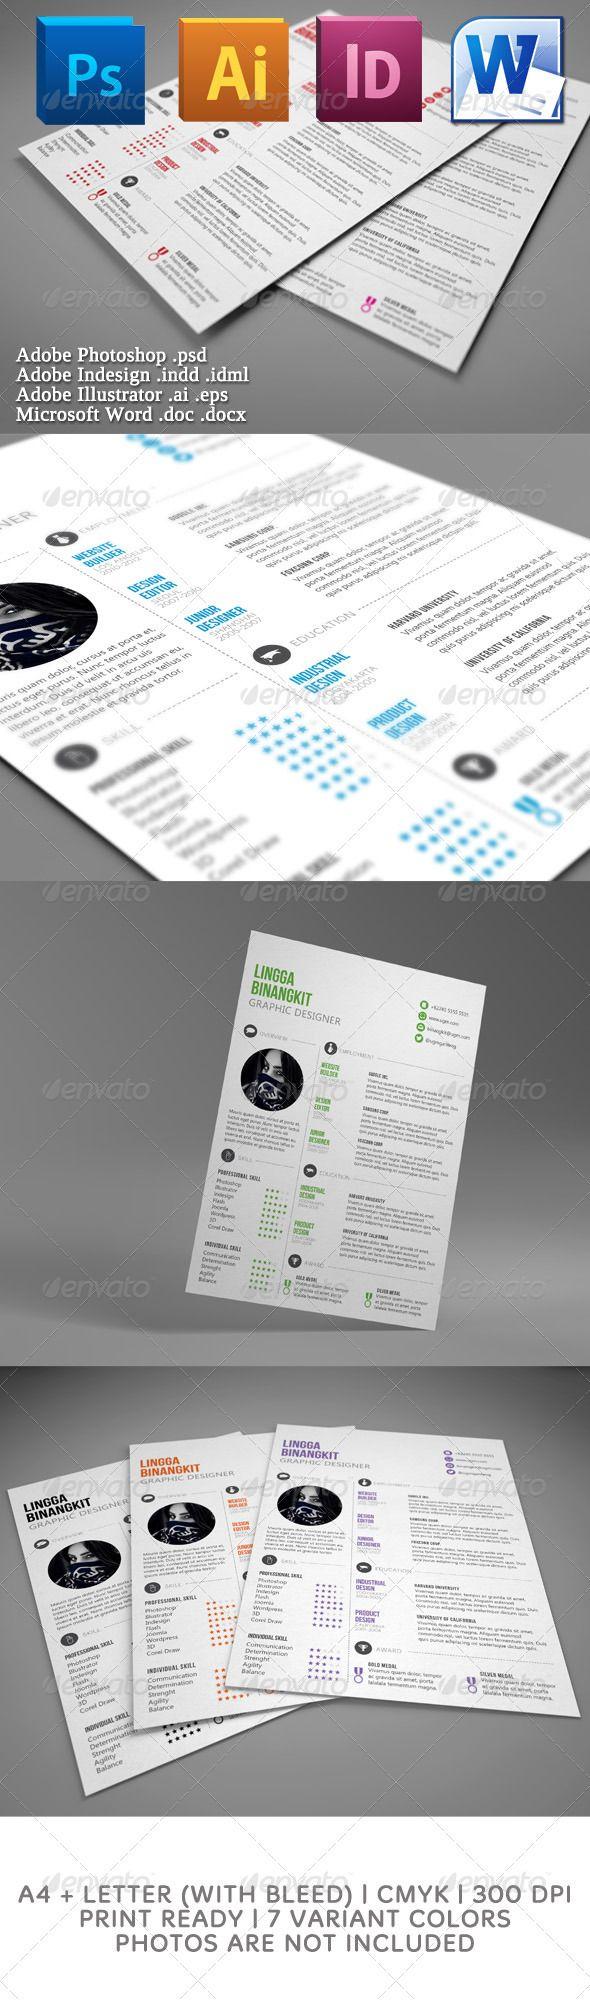 Creative Curriculum Vitae #CV #CurriculumVitae | design | Pinterest ...